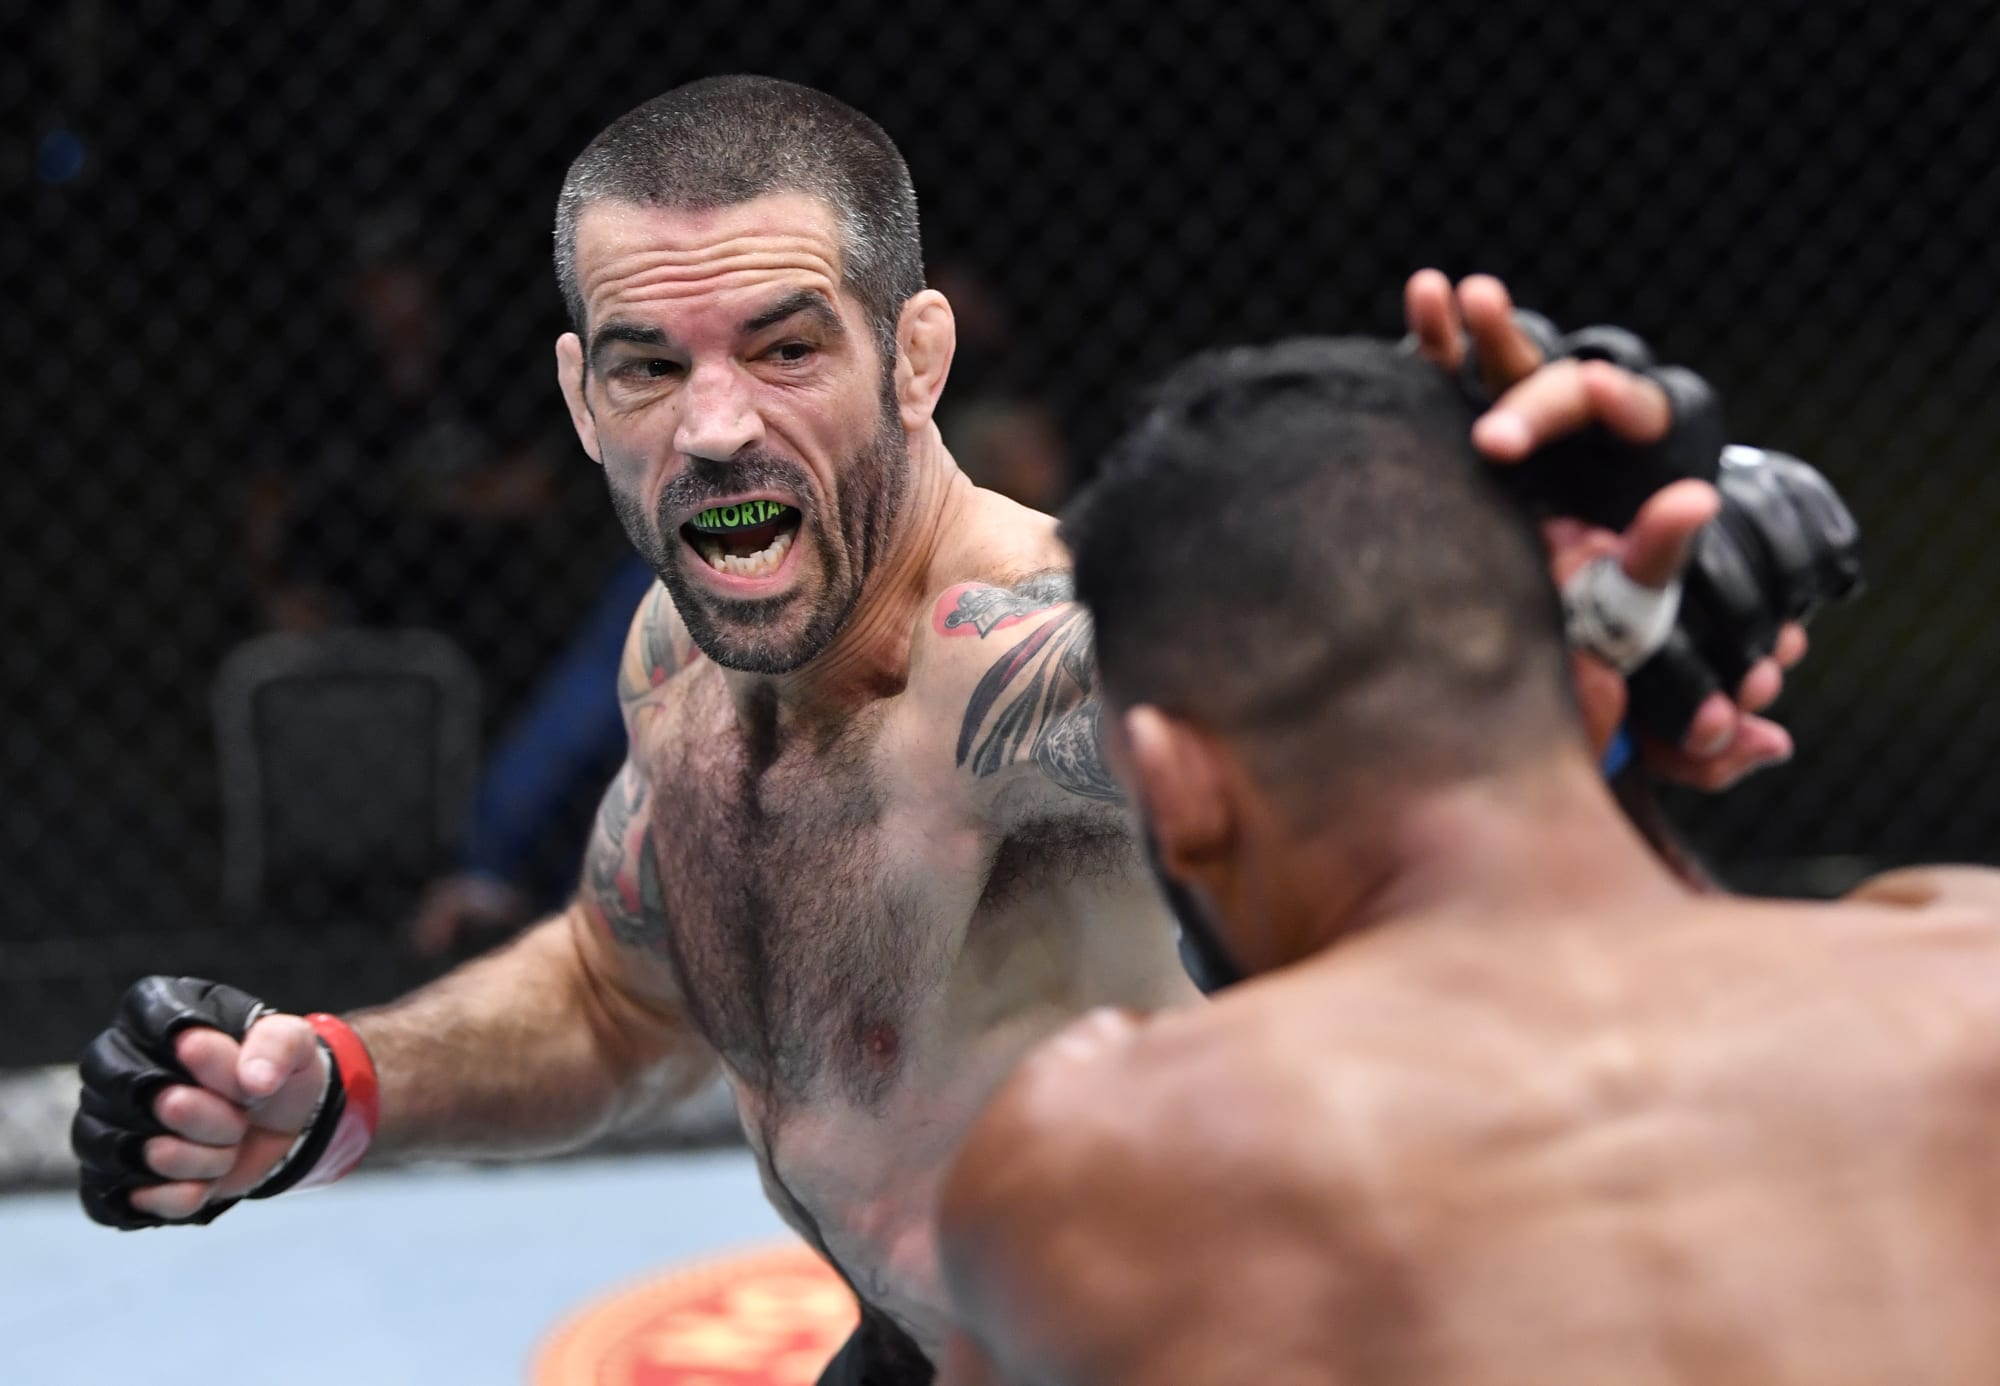 UFC Vegas 29: Matt Brown shocks with walk off KO of Dhiego Lima (Video)